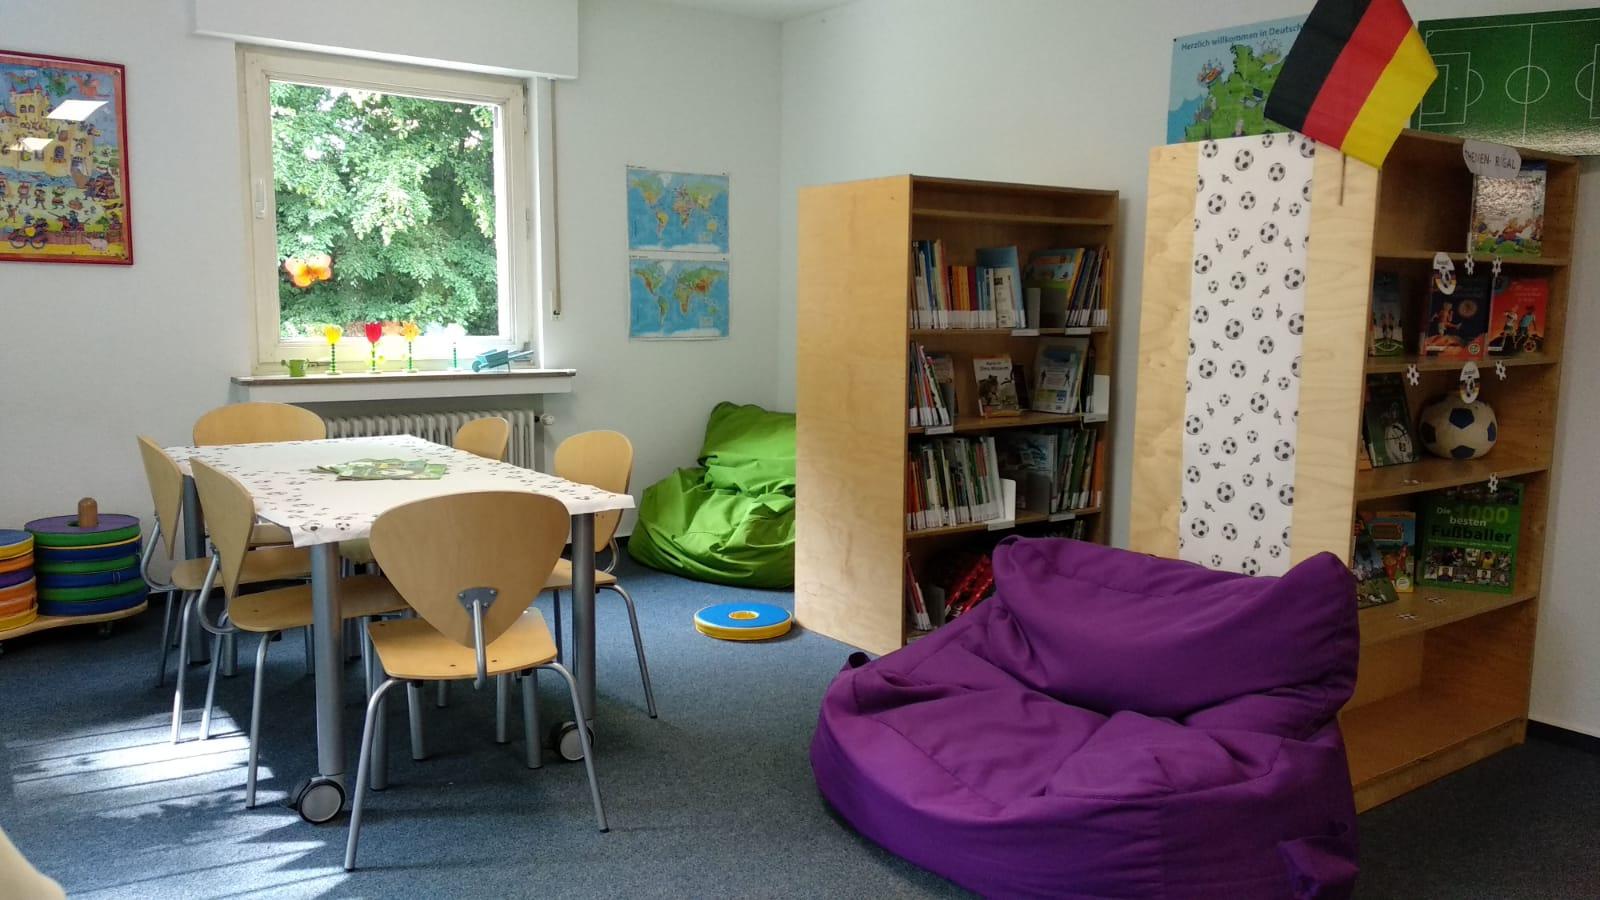 Fotogalerie Bibliothek Bild 2